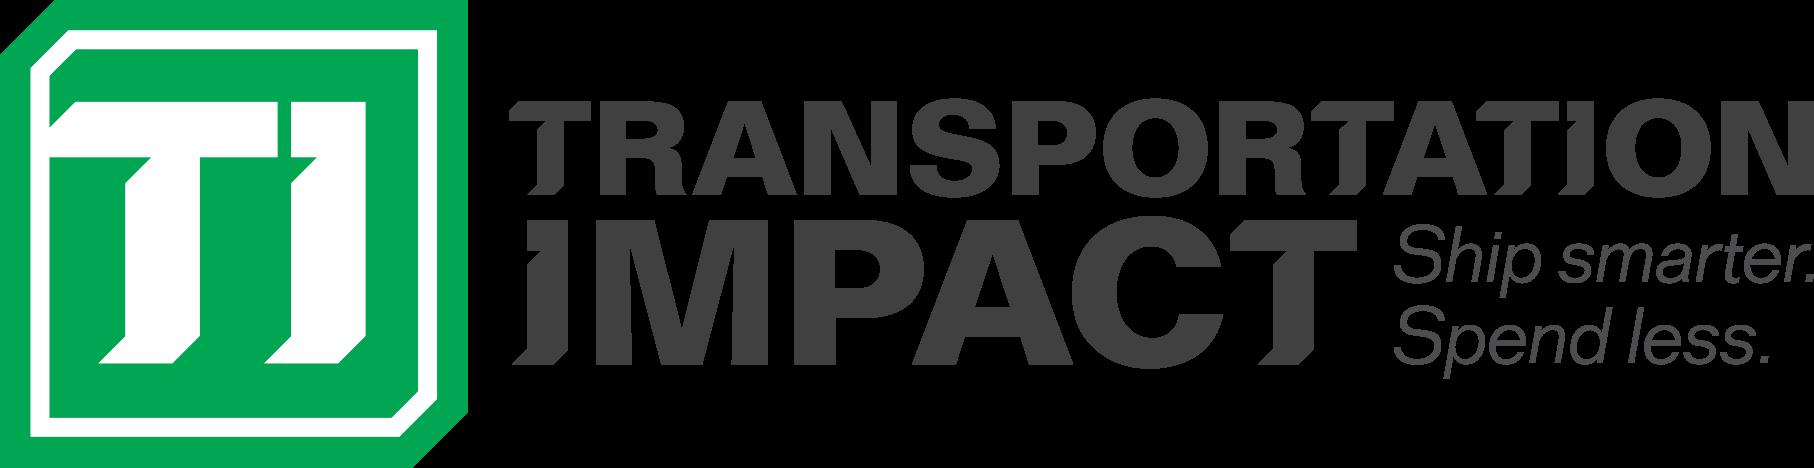 TransportationImpact